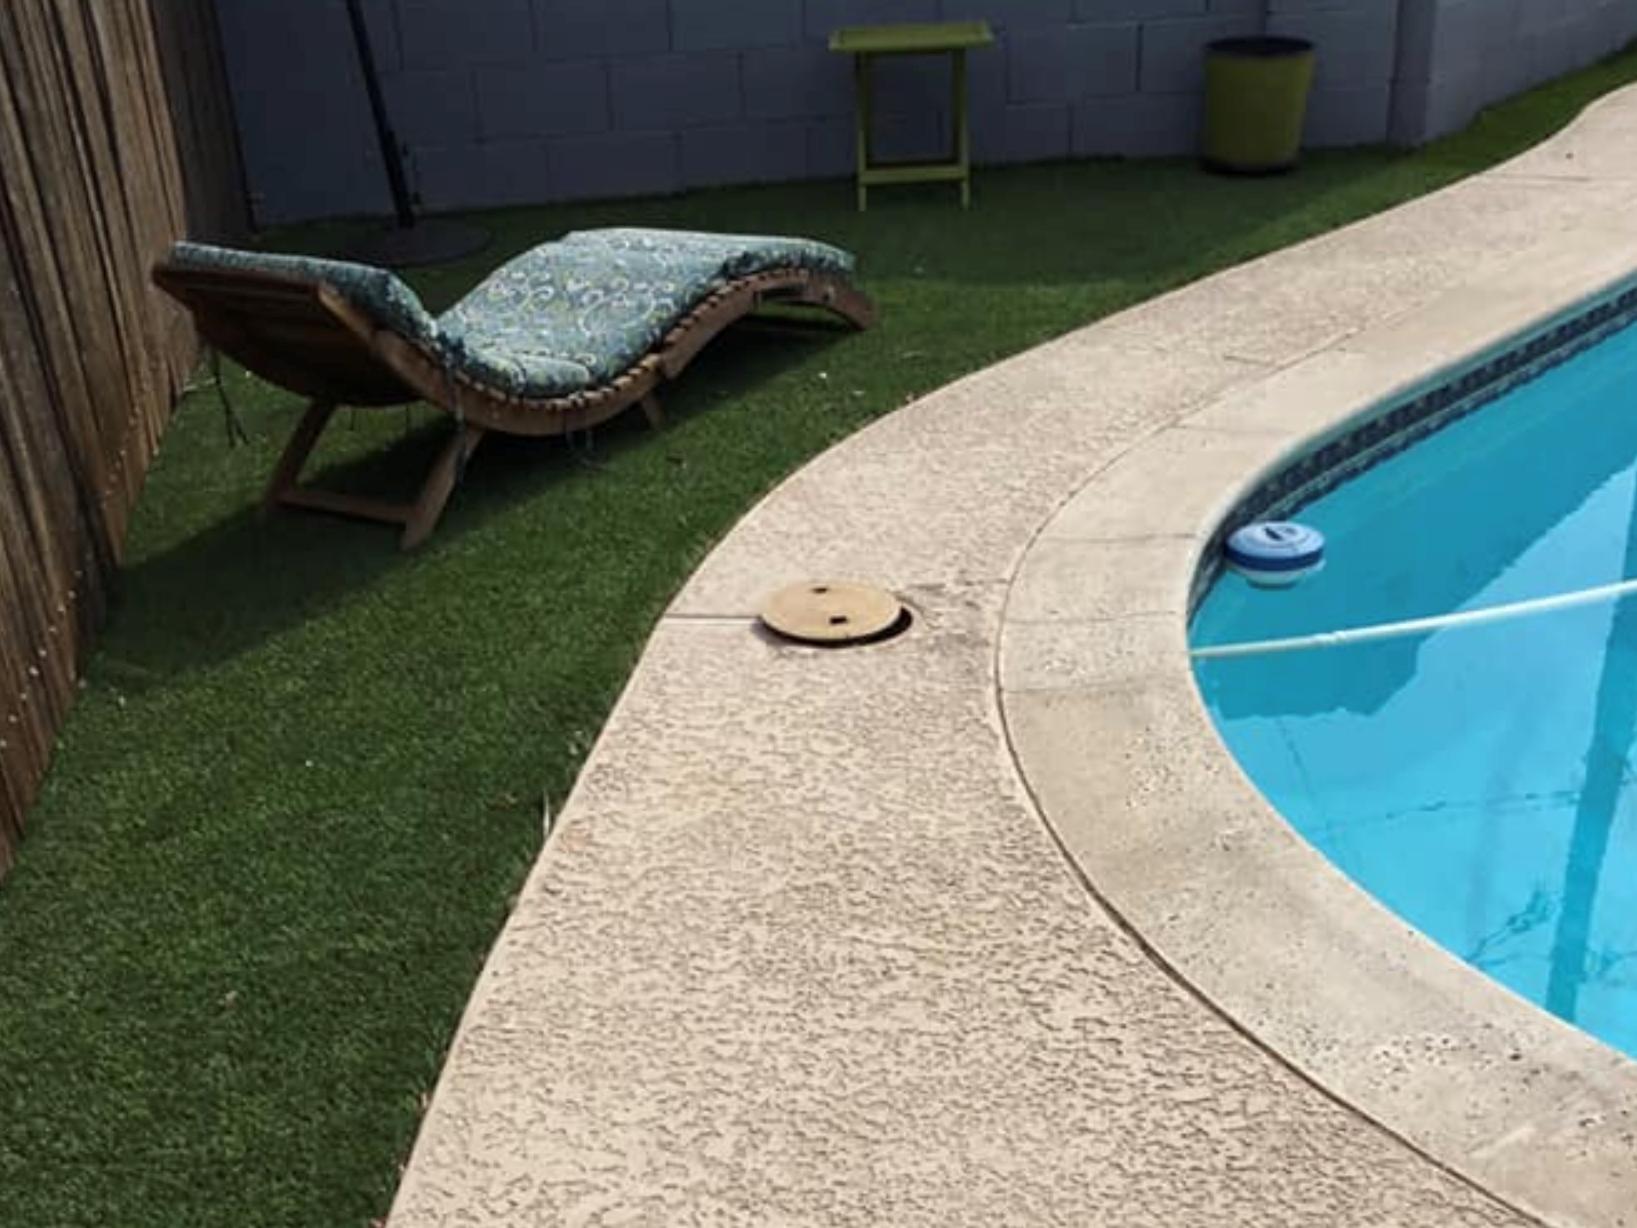 this image shows pool deck in Fullerton, California